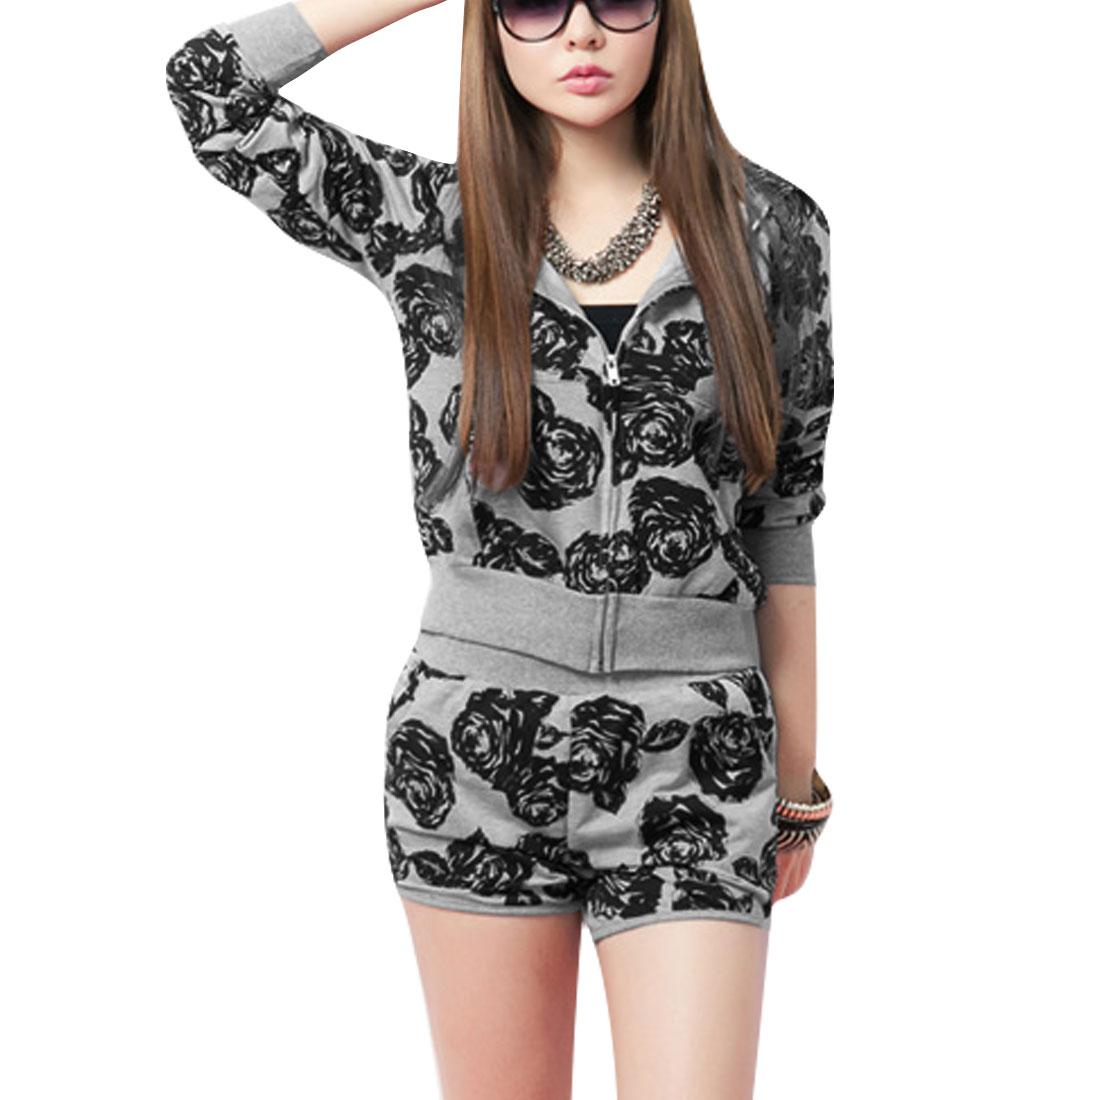 Woman Zip-Up Closure Floral Pattern Gray Black Coat w Elastic Waist Shorts XS